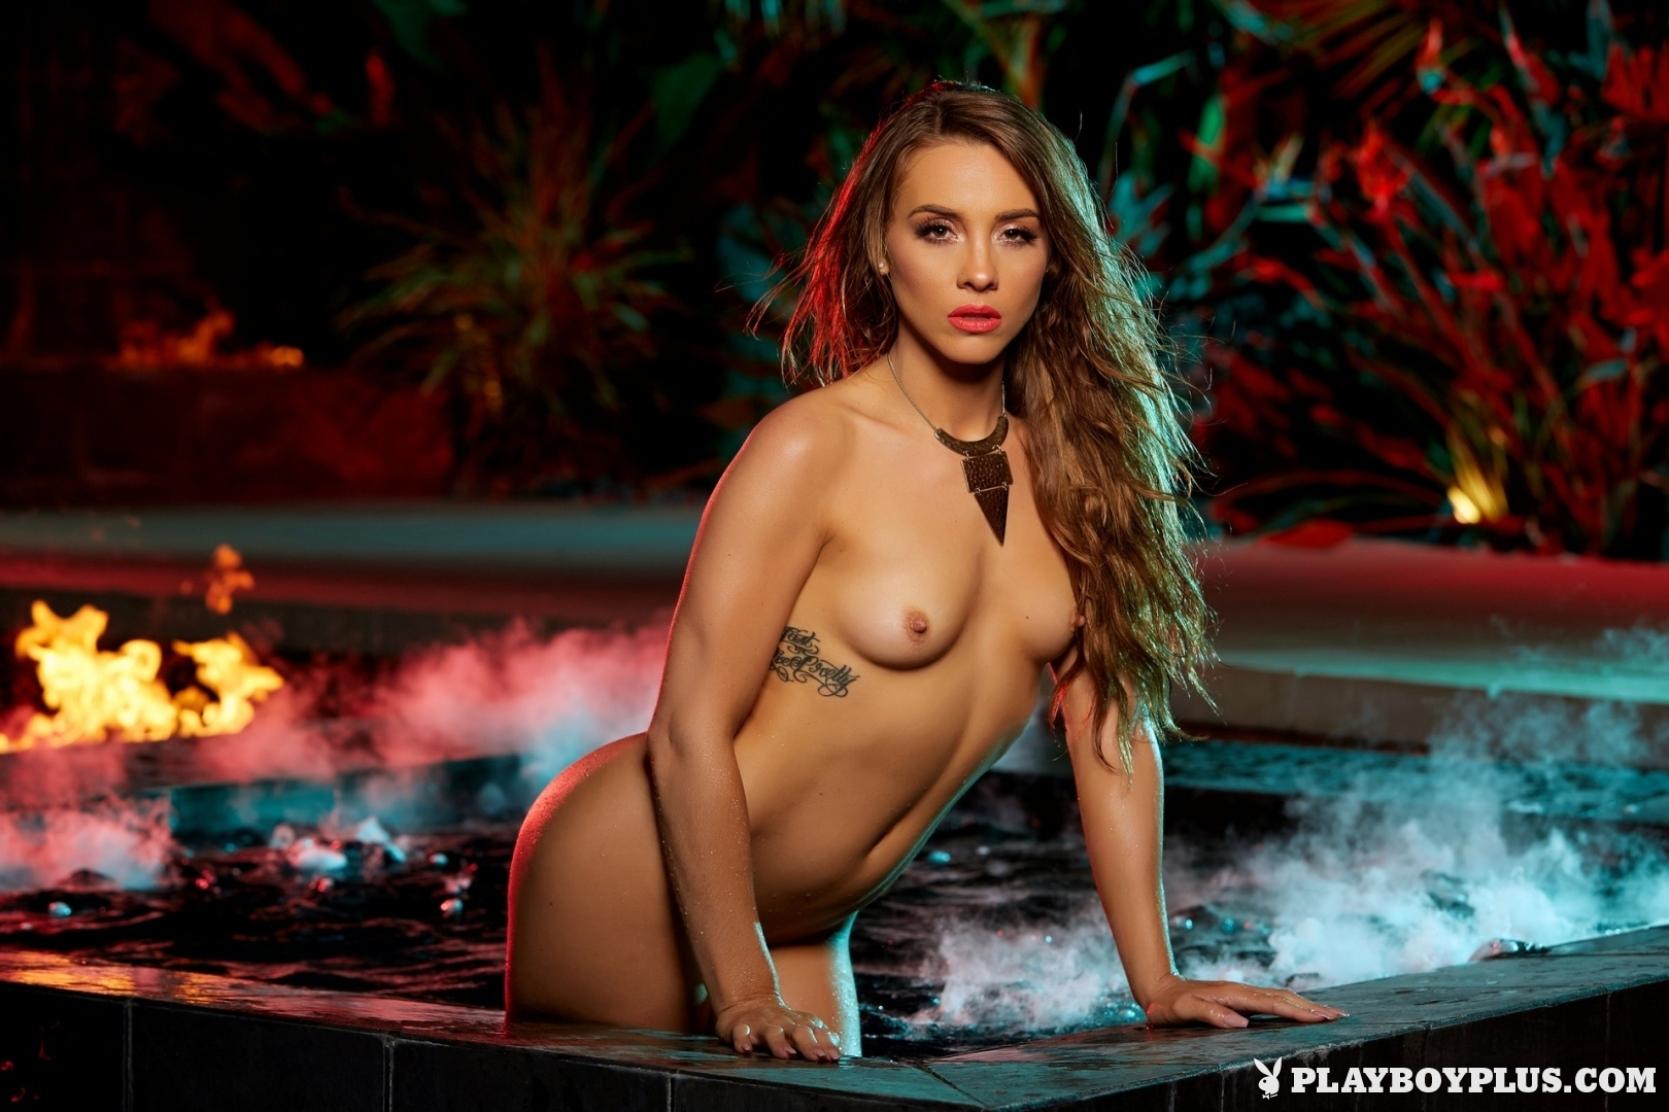 Playboy Plus | Lauryn Elaine in Picking up Steam 12